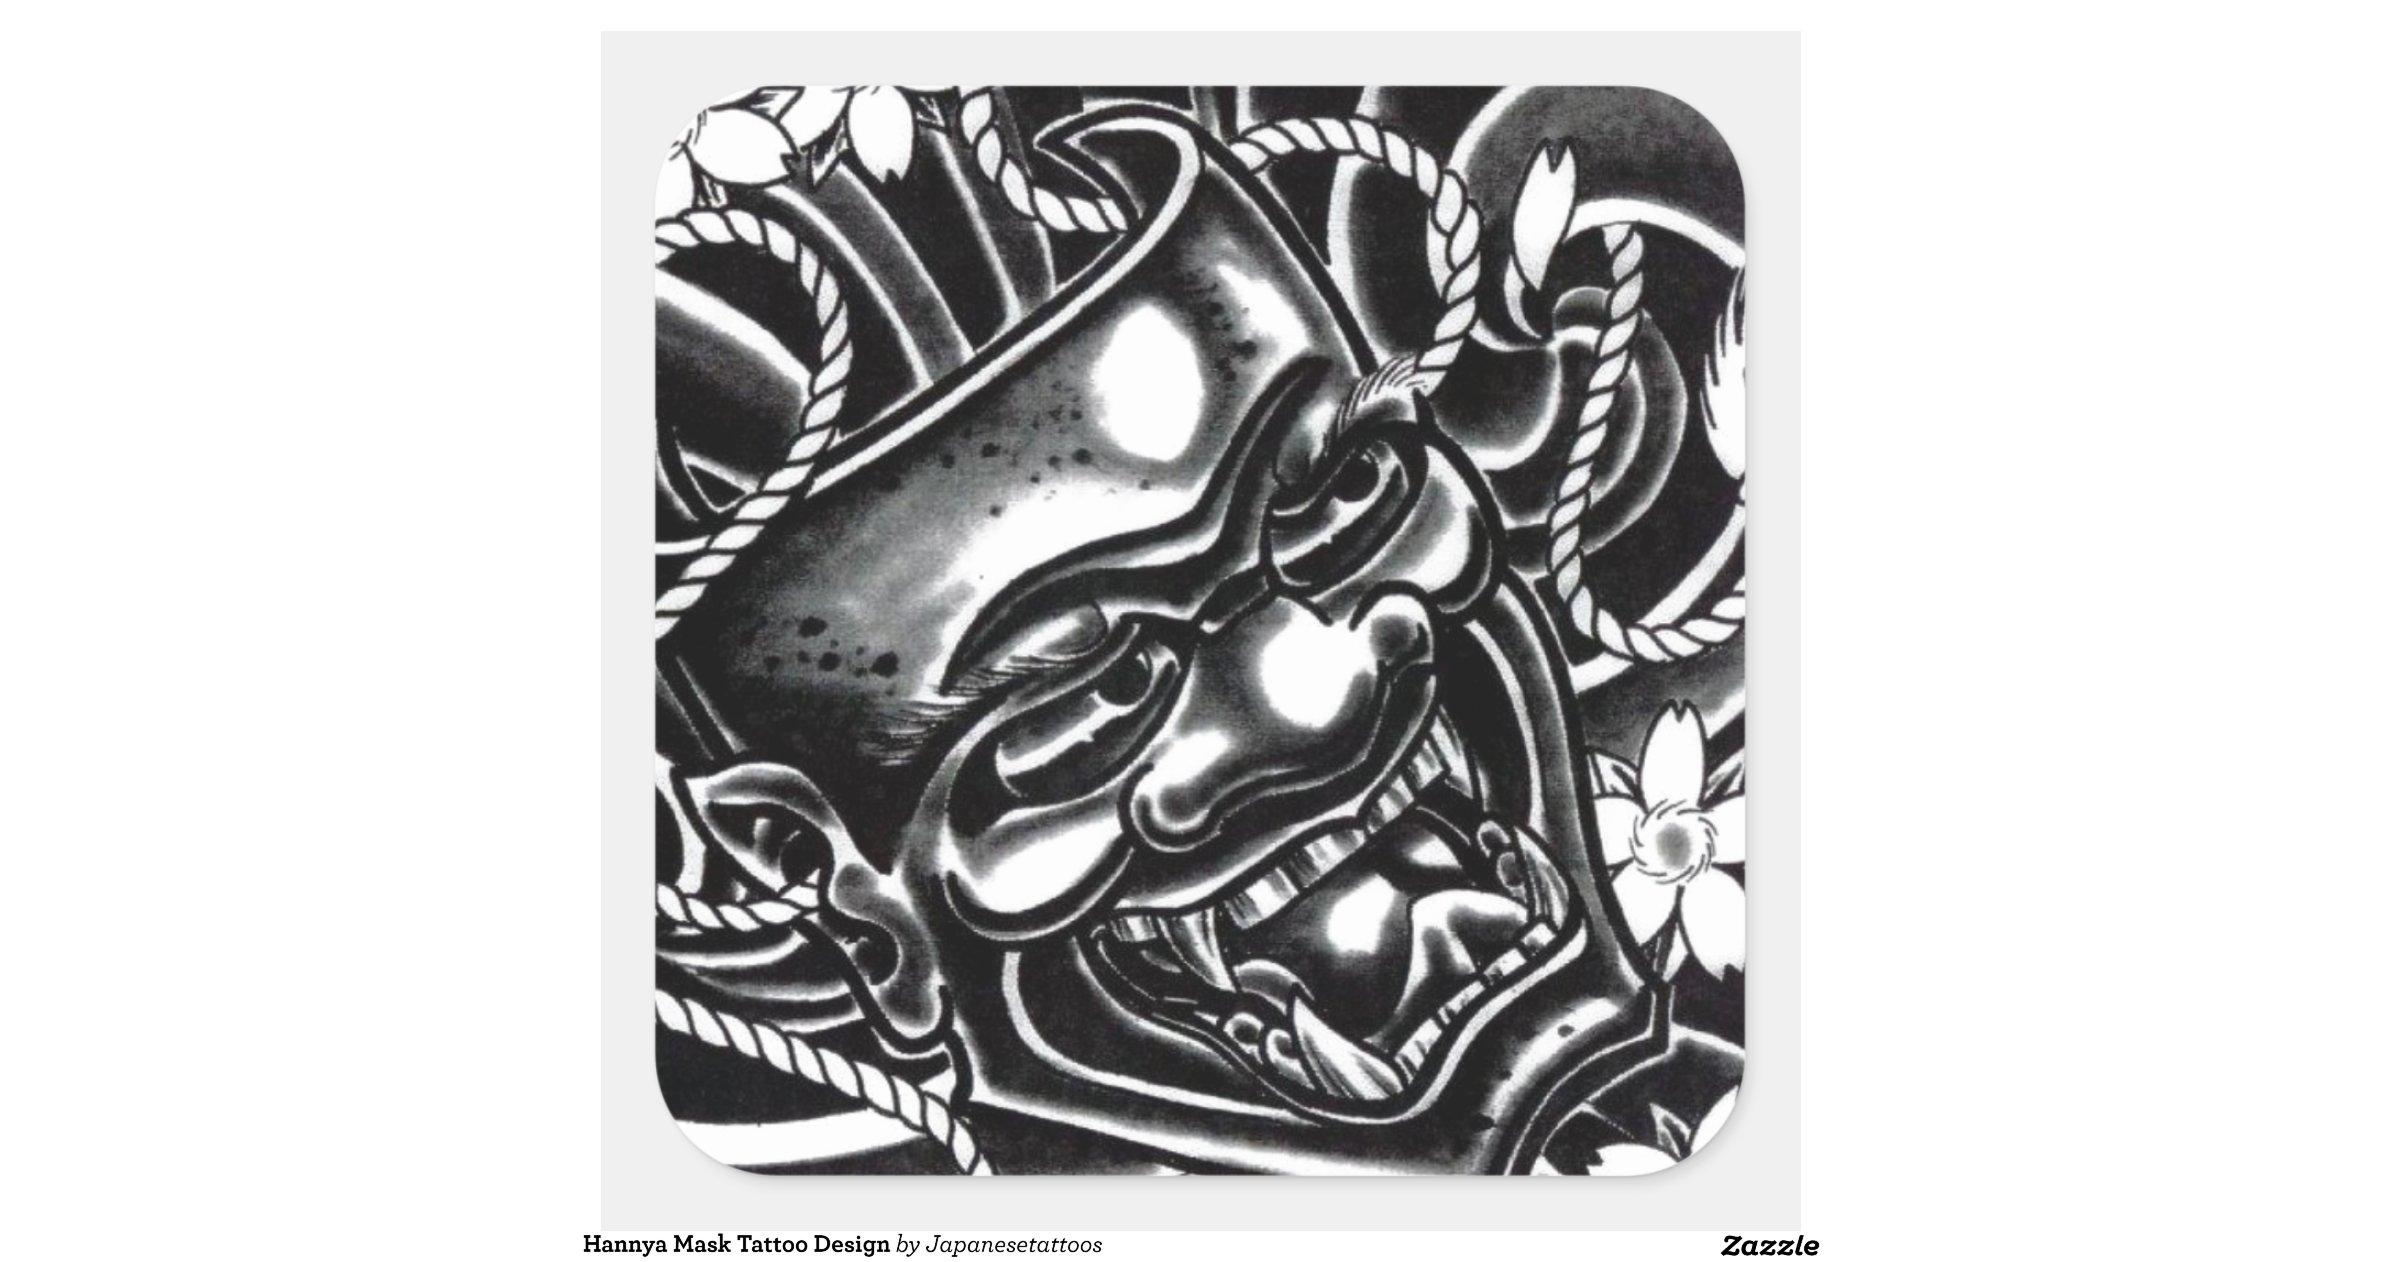 hannya mask tattoo design square sticker zazzle. Black Bedroom Furniture Sets. Home Design Ideas